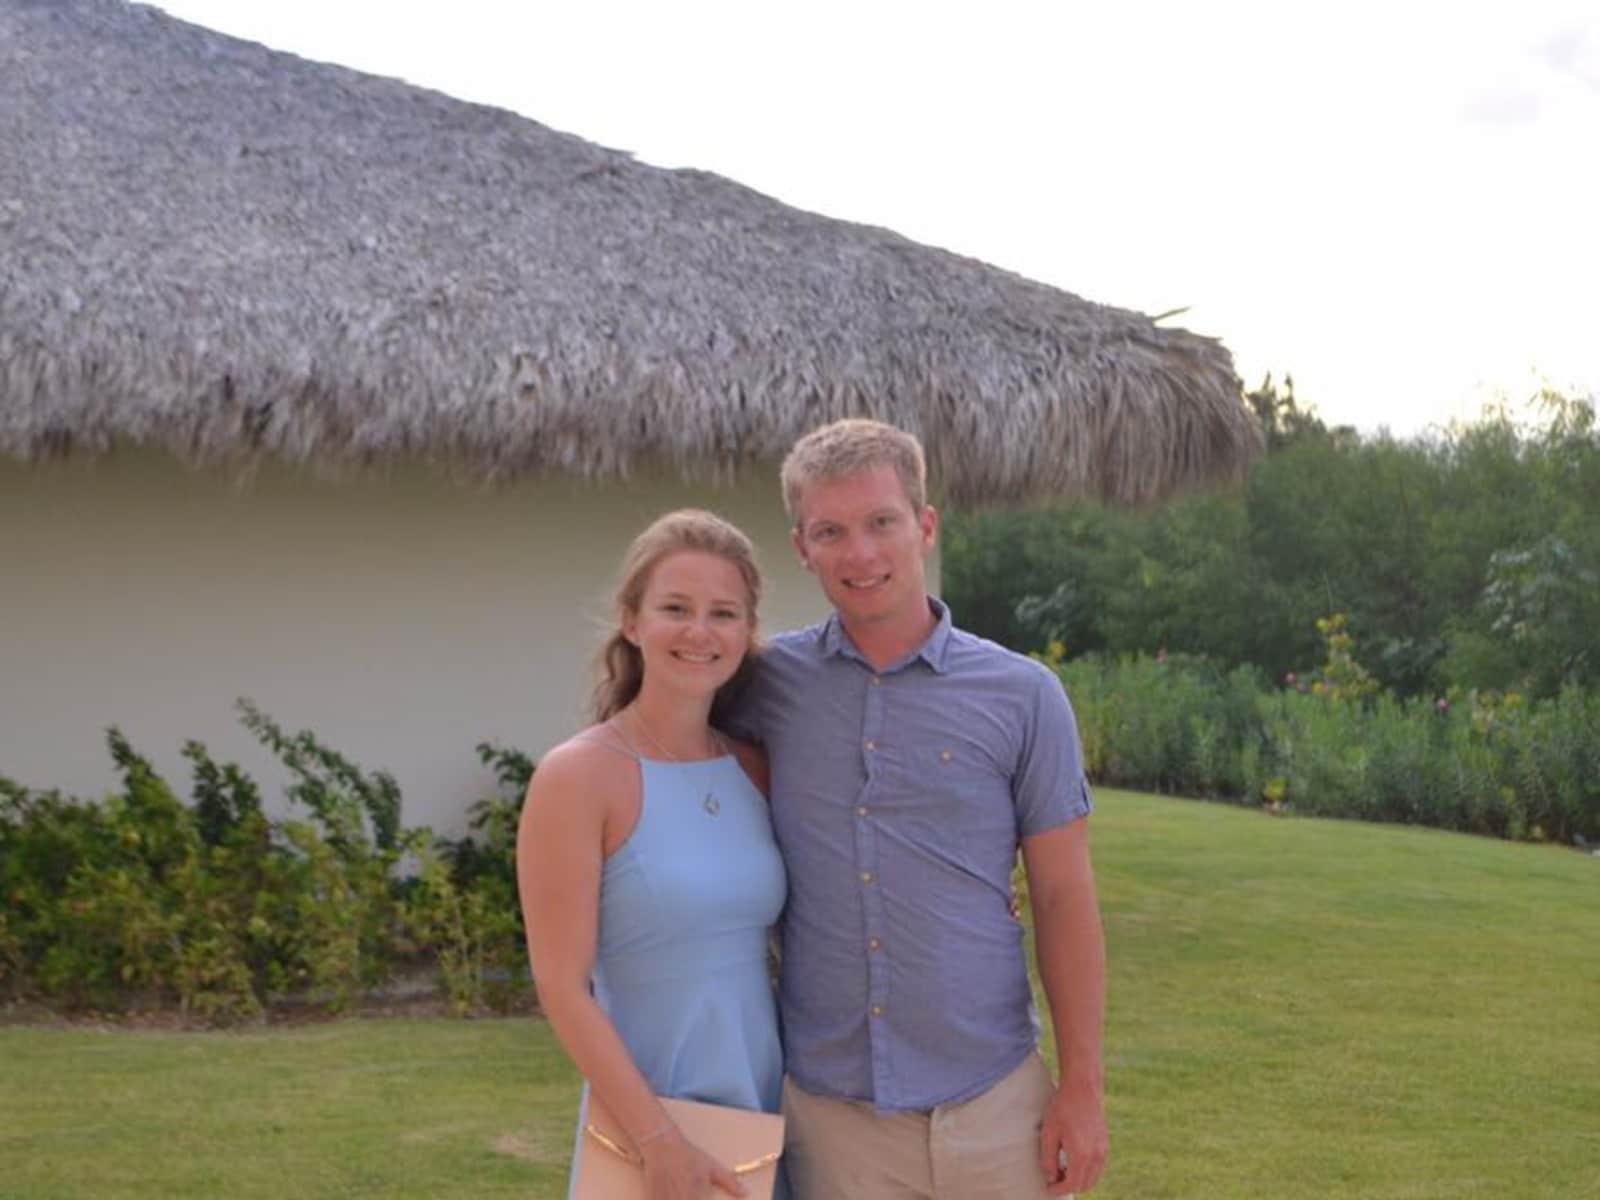 Corbin & Emma from Reading, United Kingdom